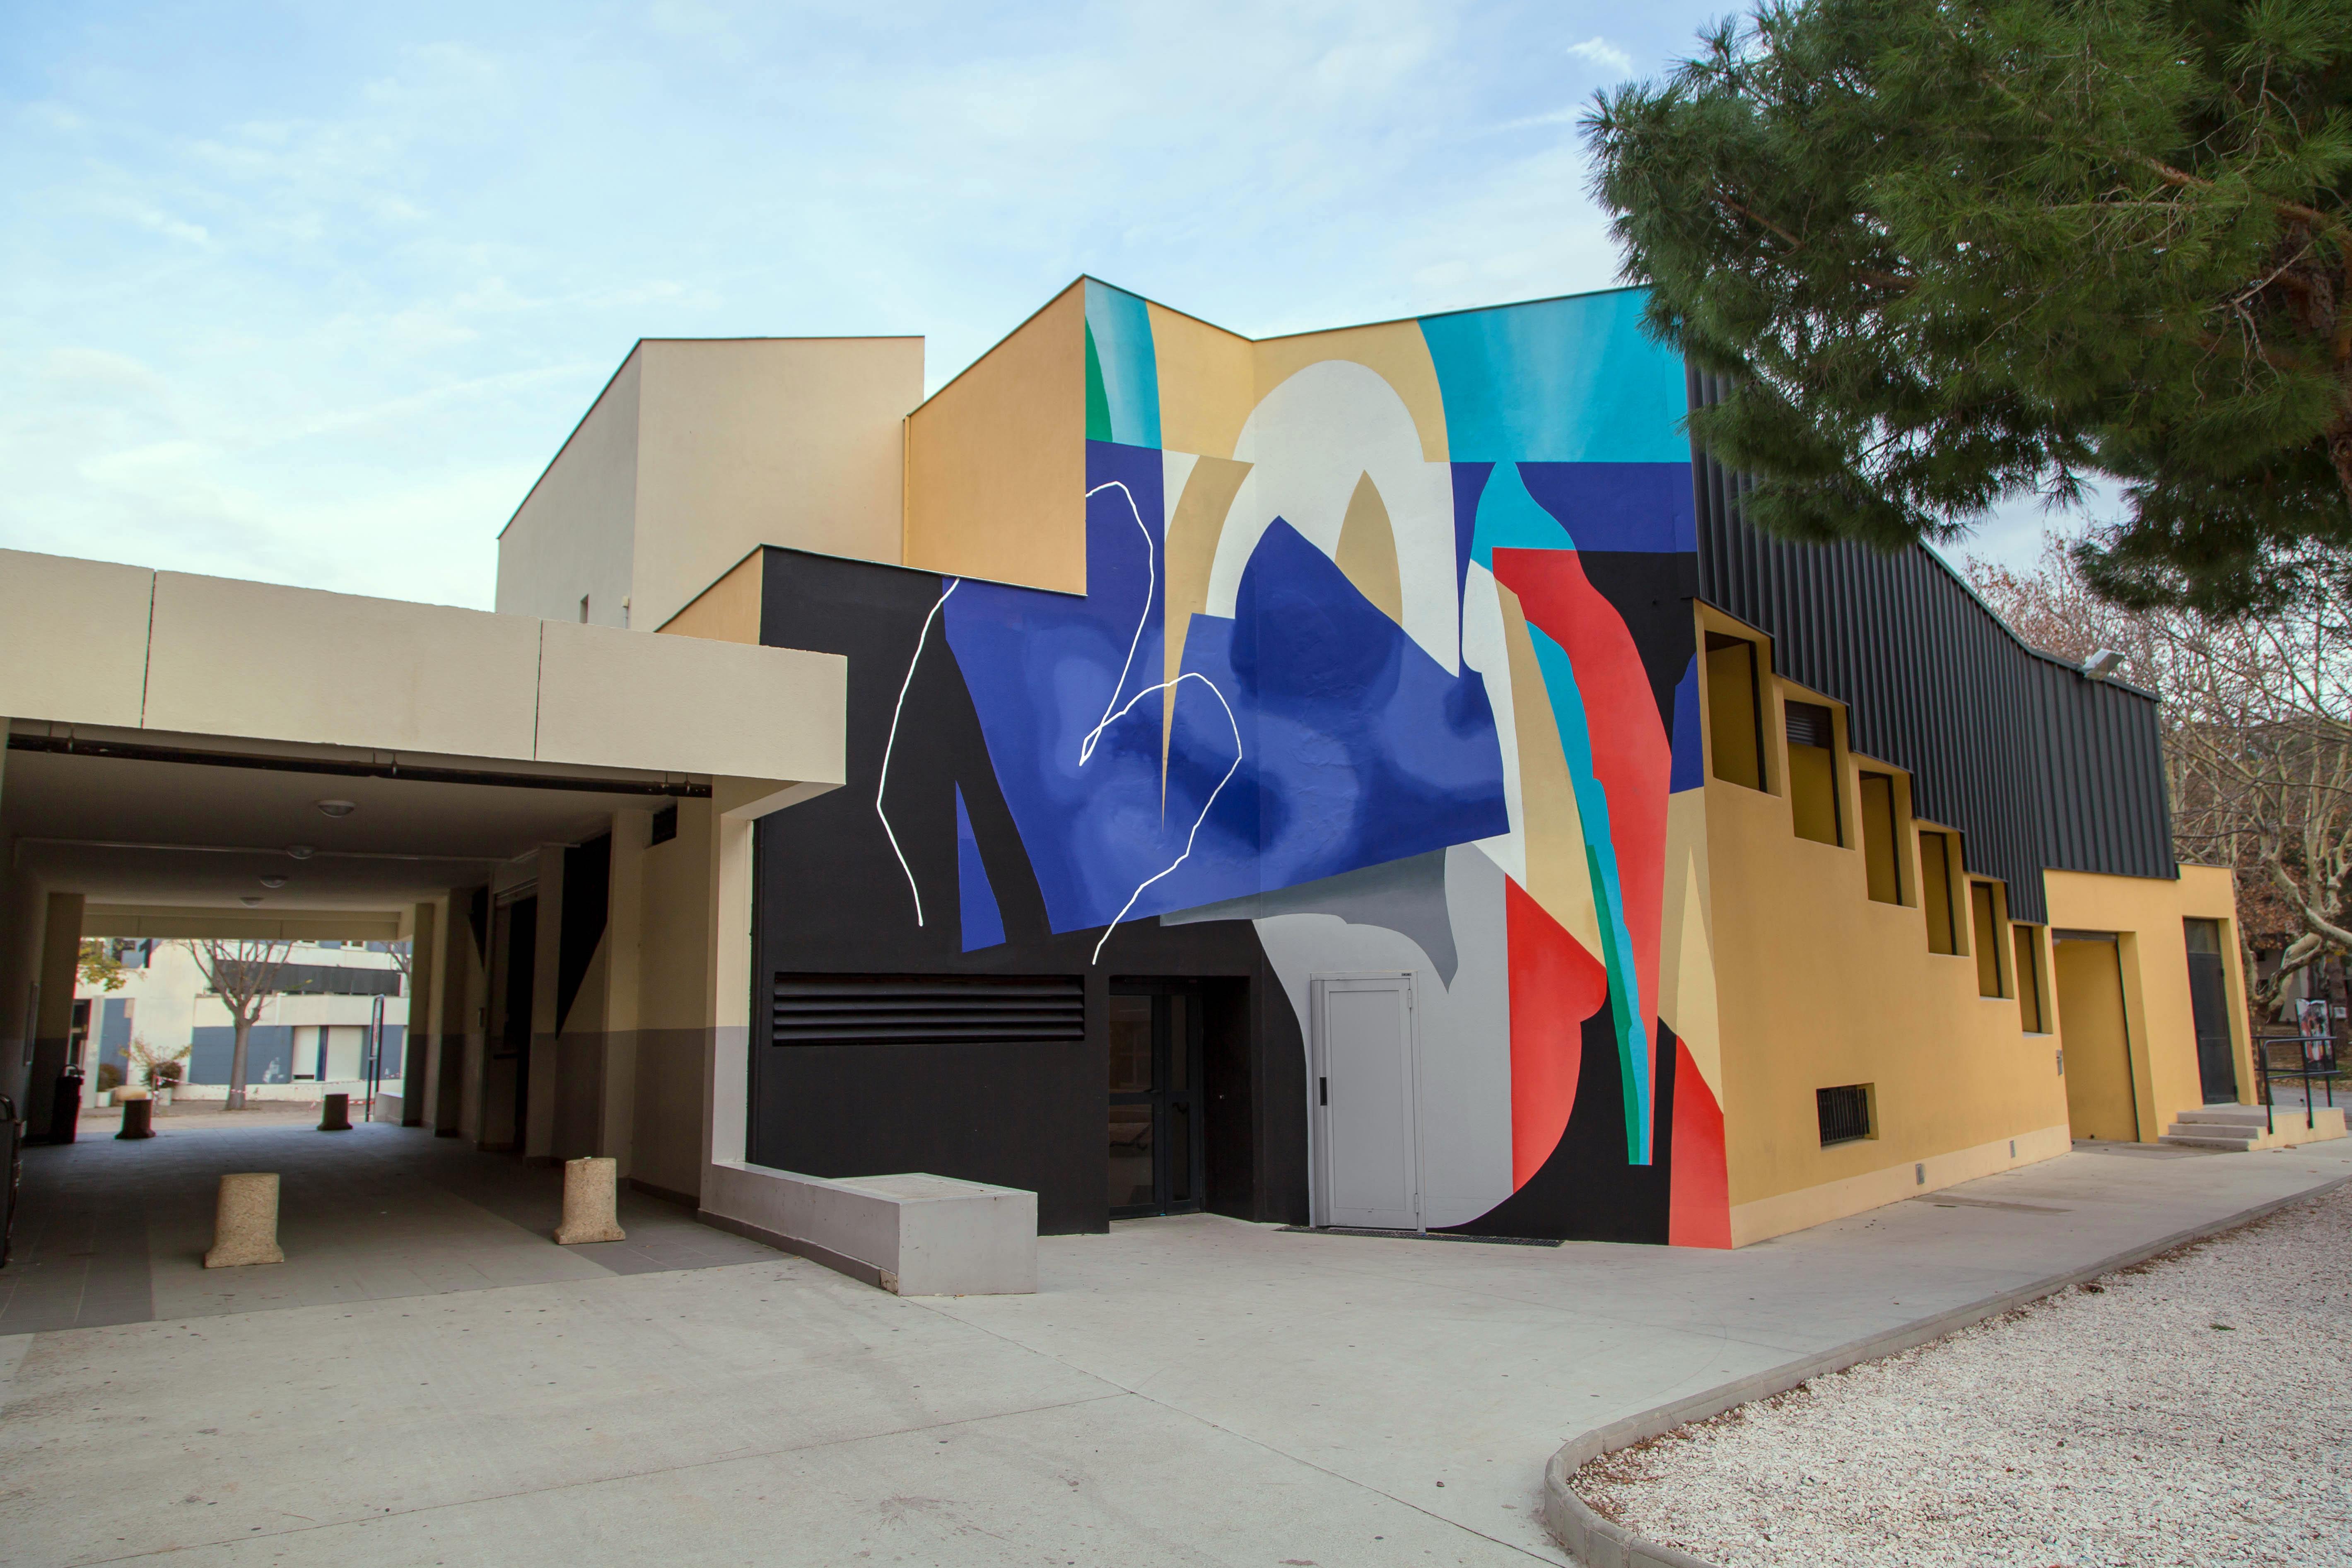 Blo new mural in Perpignan, France Artes & contextos AM FacadeM blo